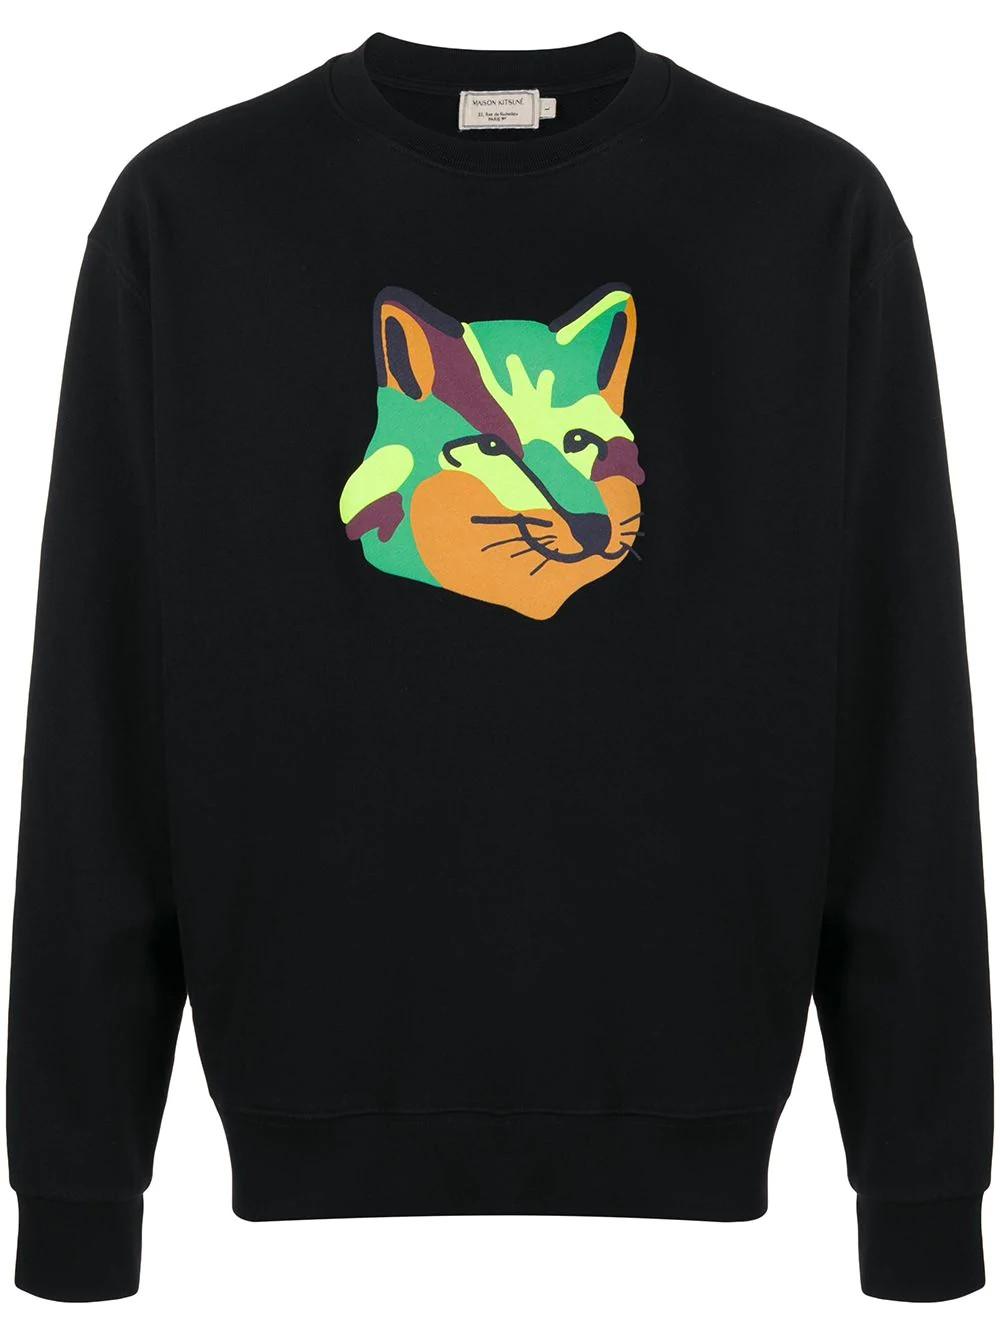 SWEATSHIRT NEON FOX PRINT